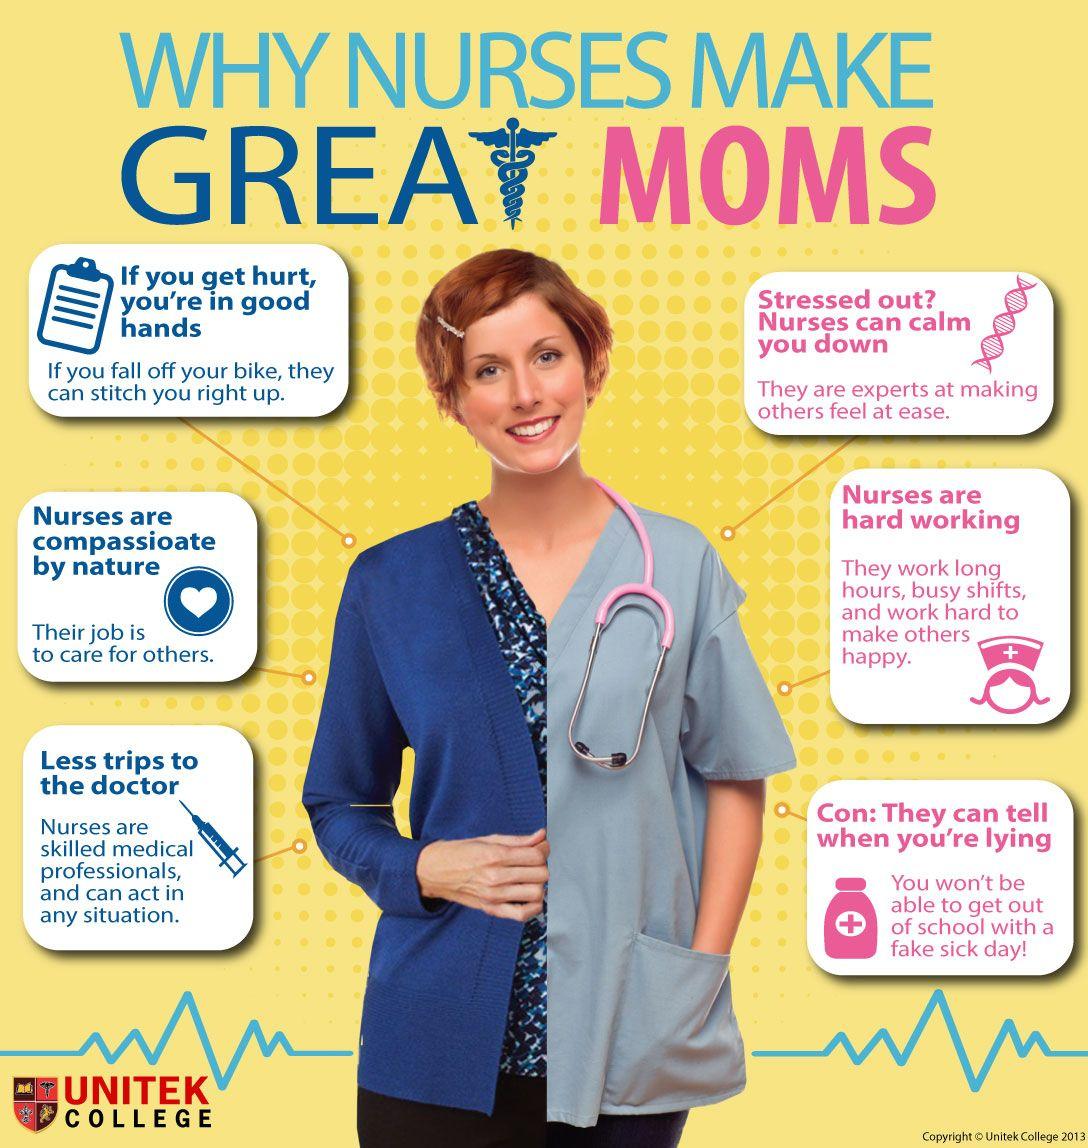 nursing school graduation gift for nurse/'s mom proud mom of a nurse mom of nurse Nurse mom gifts My favorite nurse calls me mom shirt